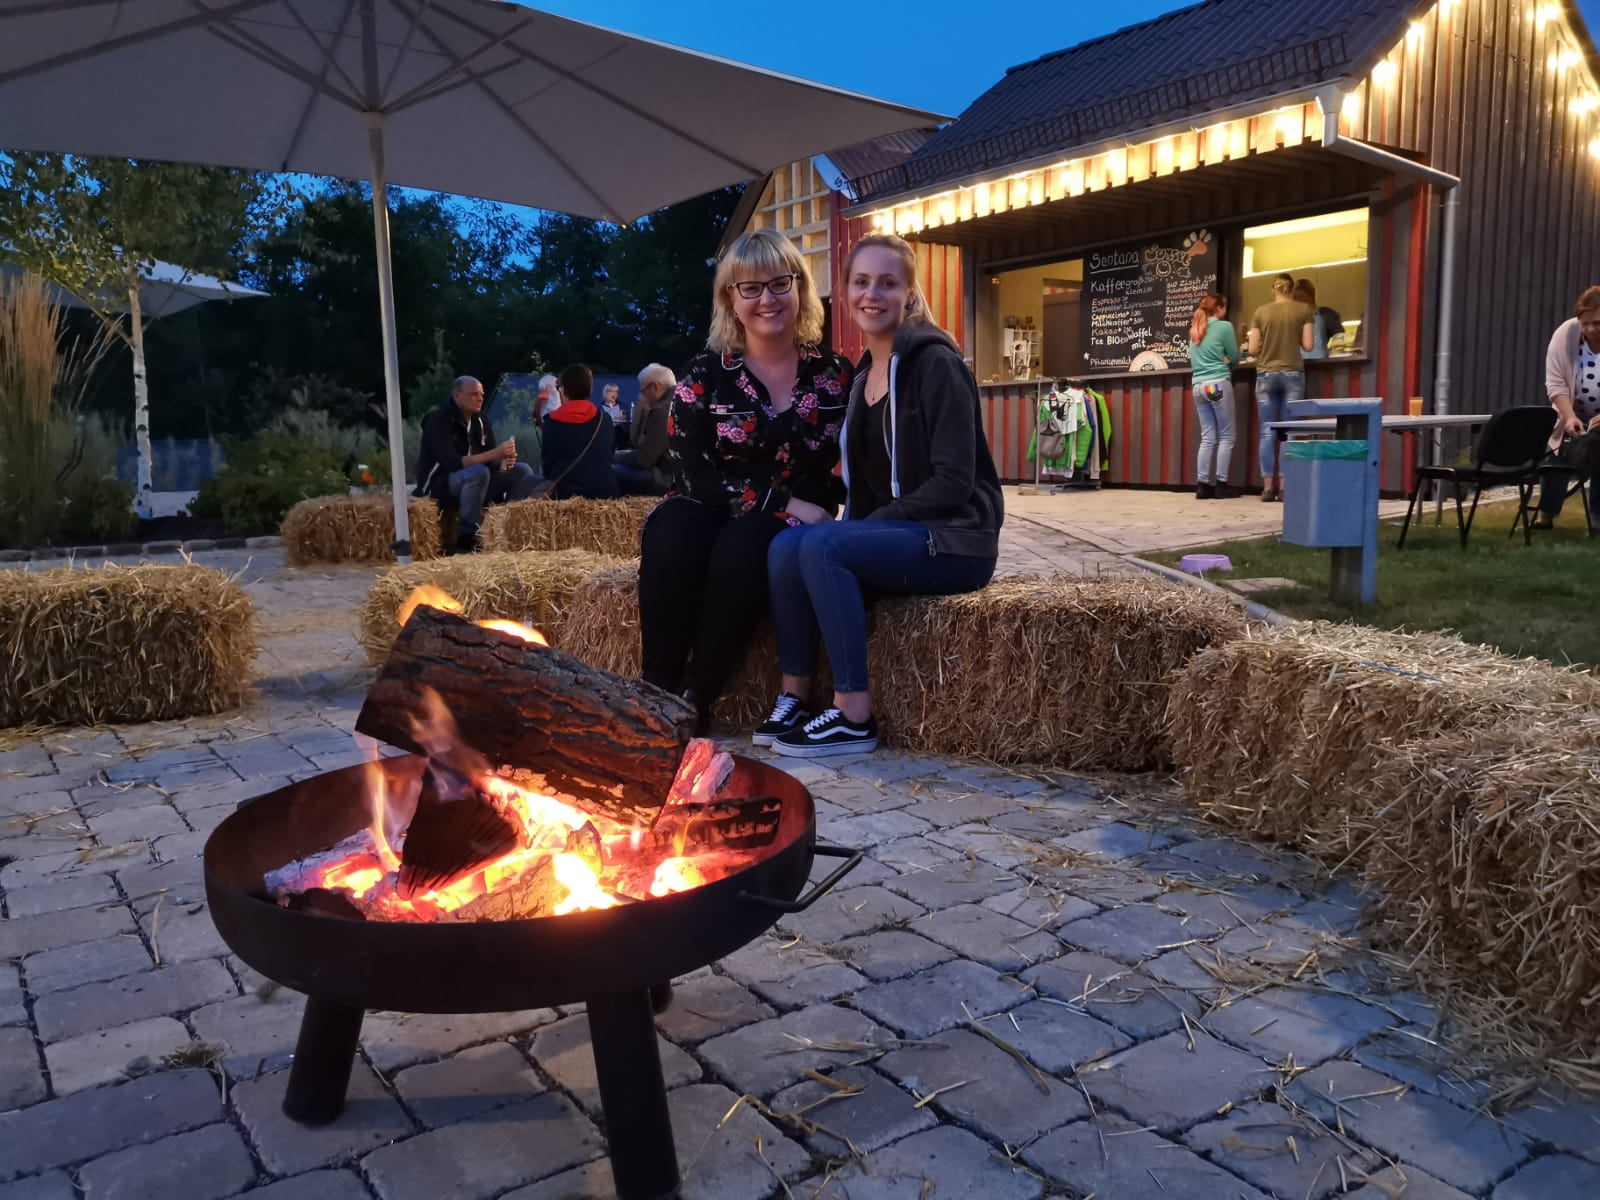 Sommerabend im Dorf